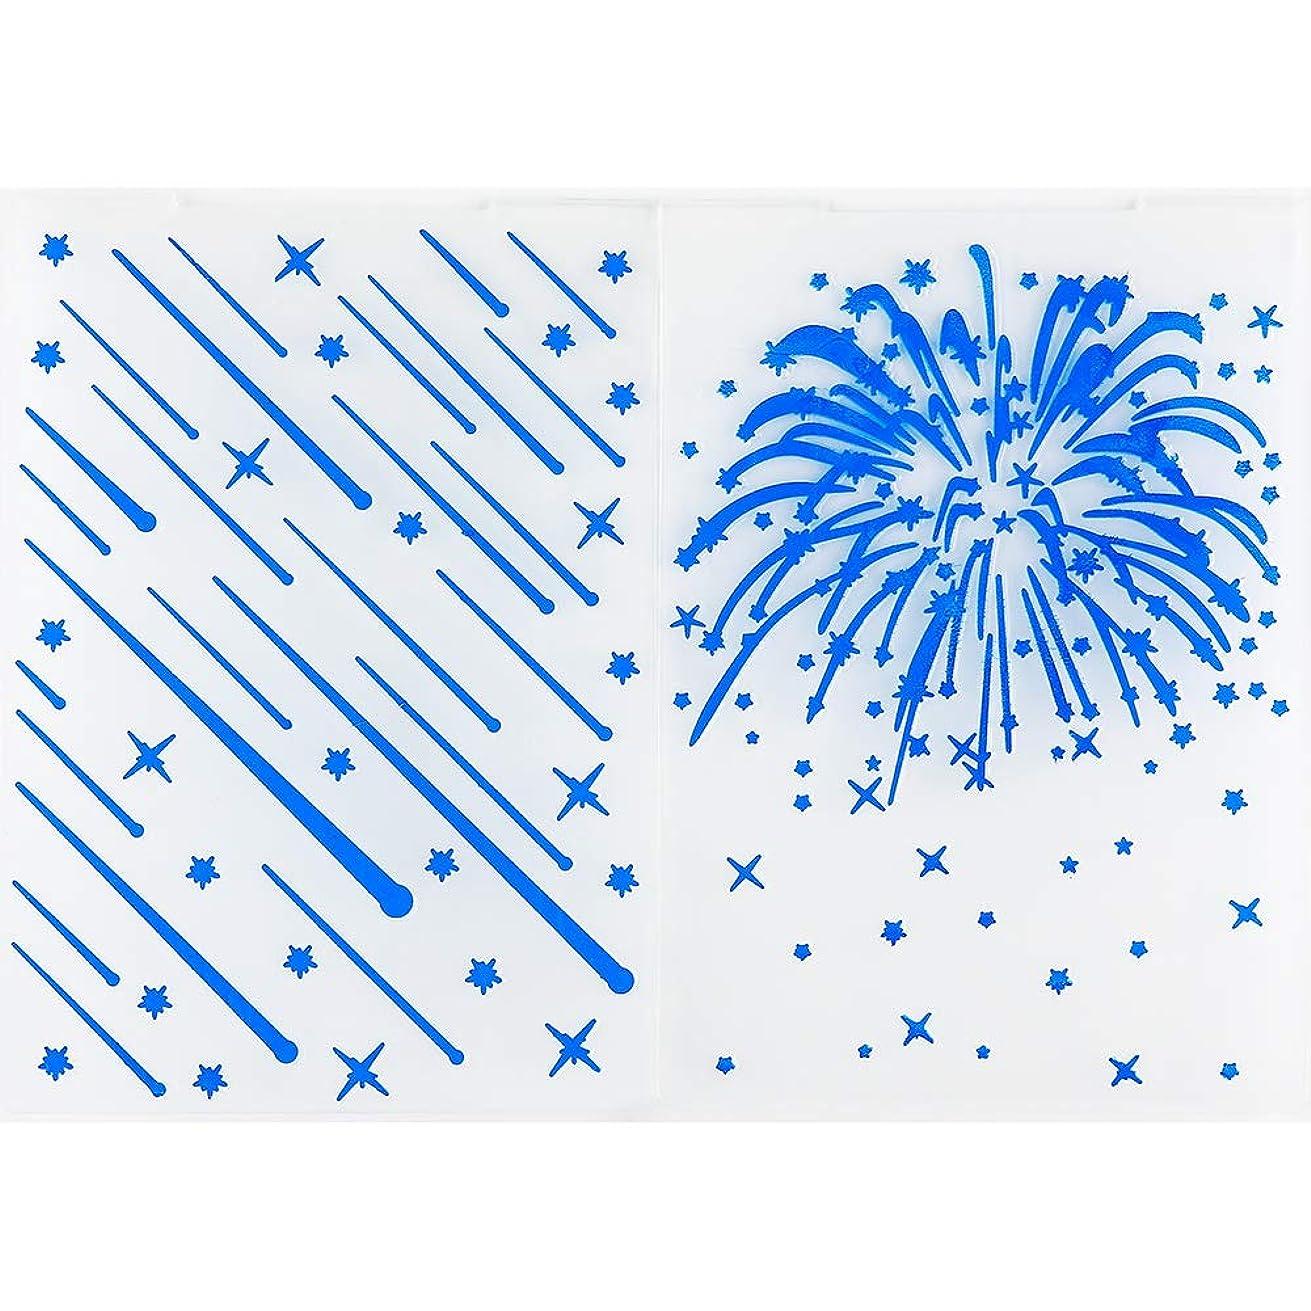 MaGuo Fireworks Meteors Embossing Folders for DIY Scrapbooking Photo Album Card Making Decorative